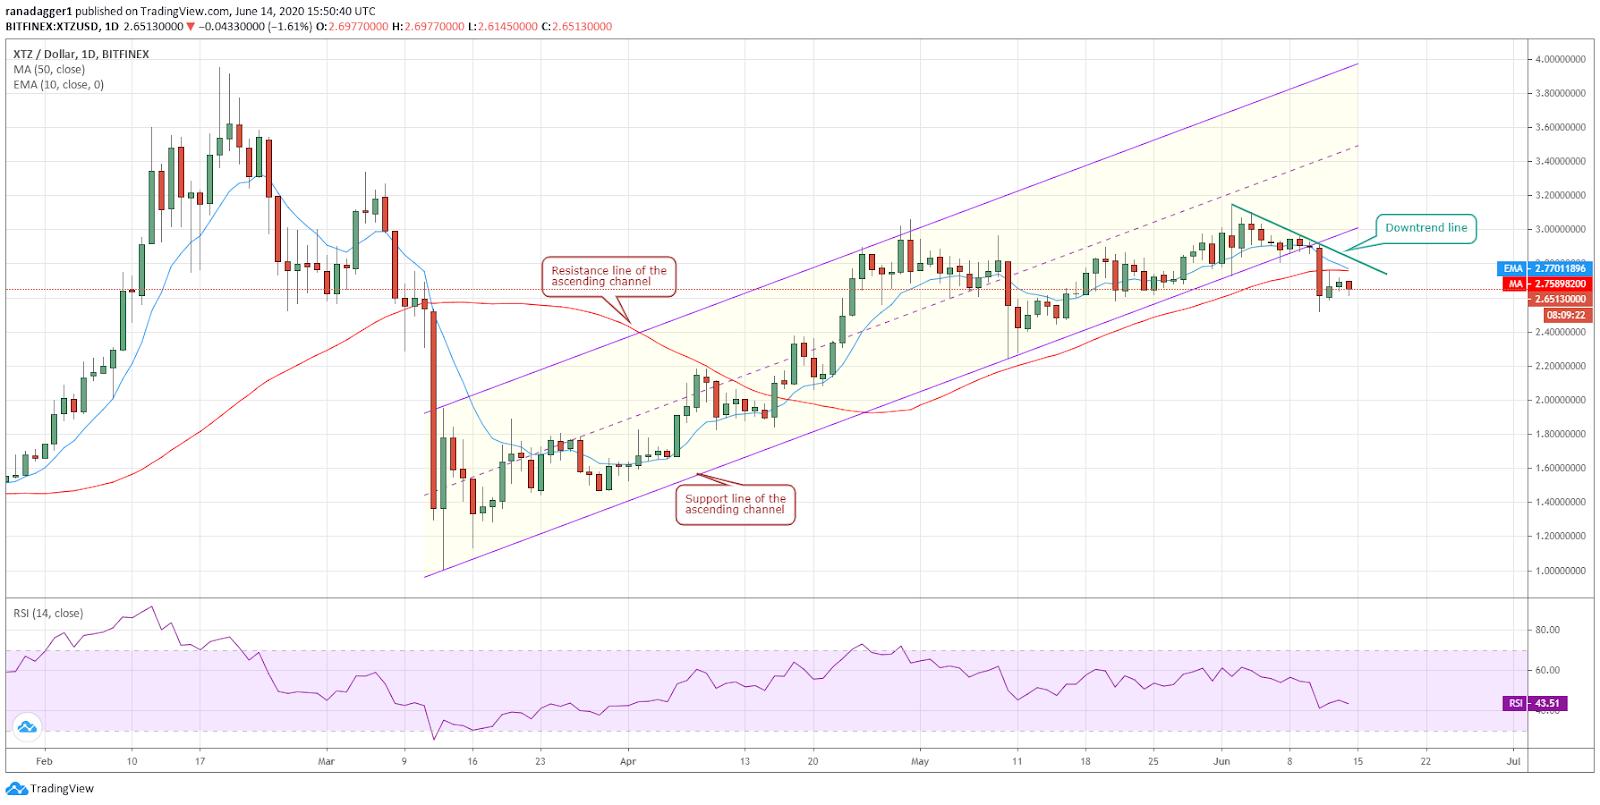 XTZ/USD daily chart. Source: Tradingview